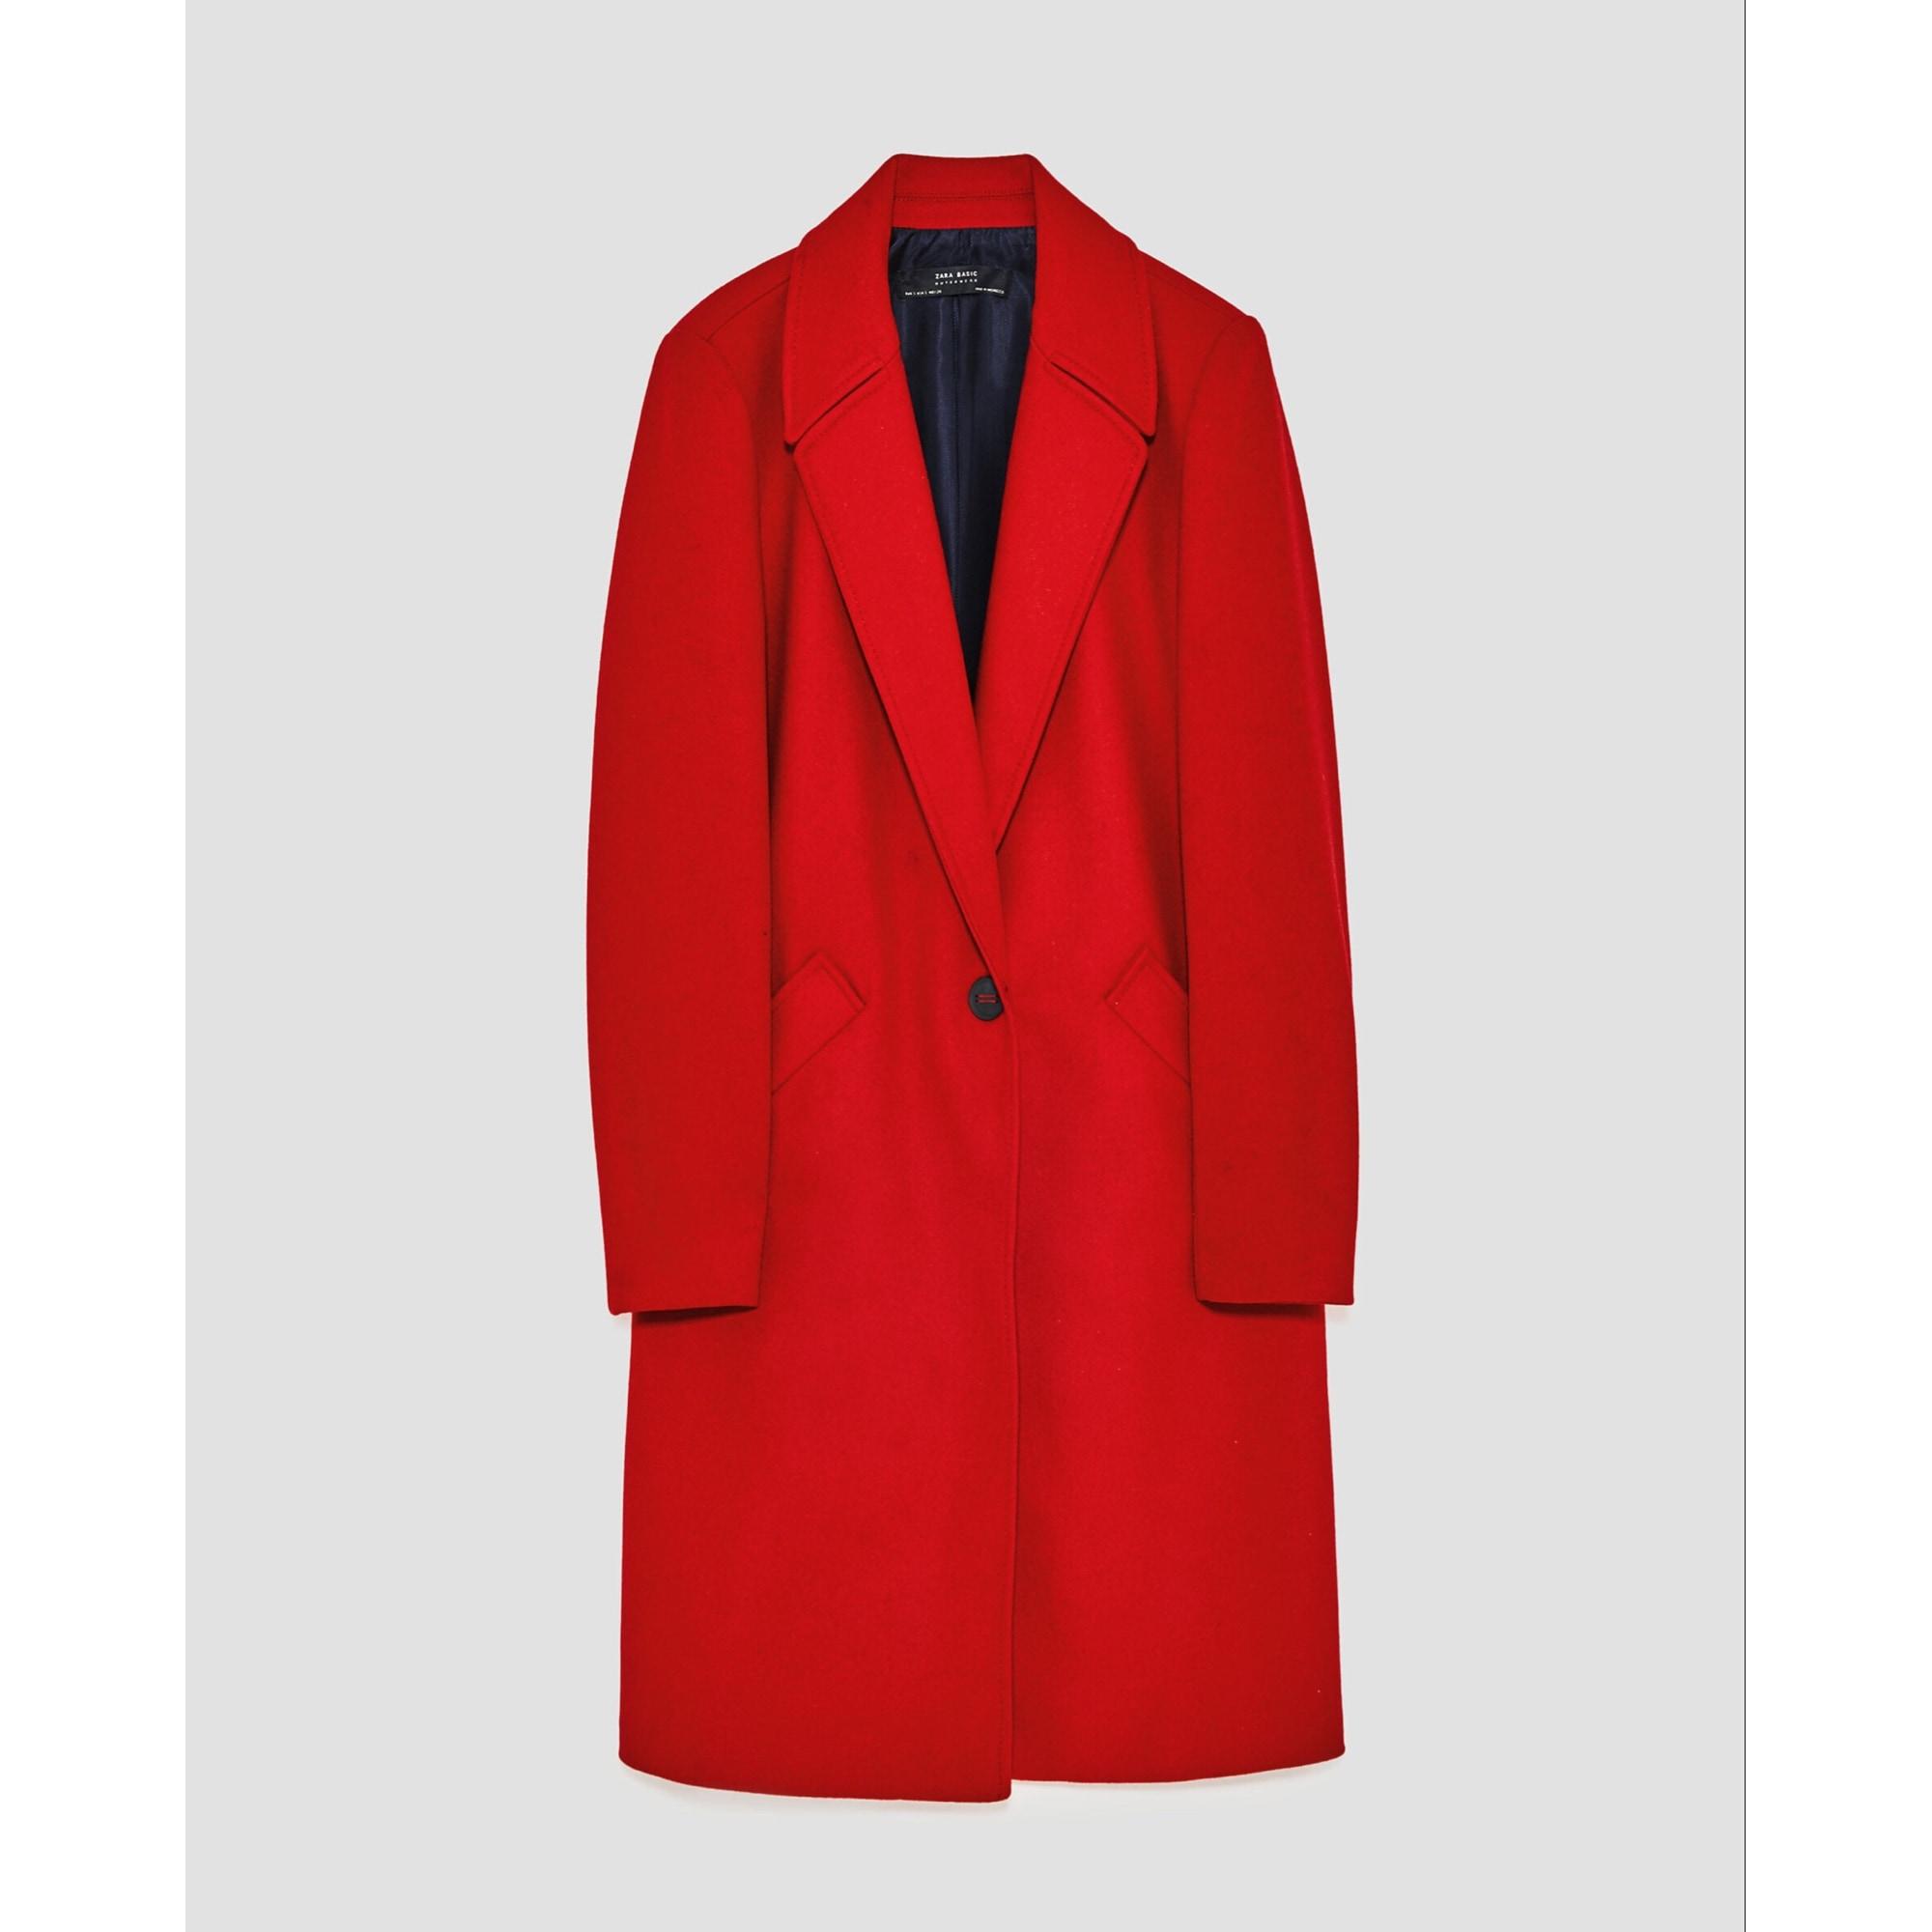 tailleur zara manteau rouge zara rouge tailleur tailleur manteau manteau lK351uTFcJ